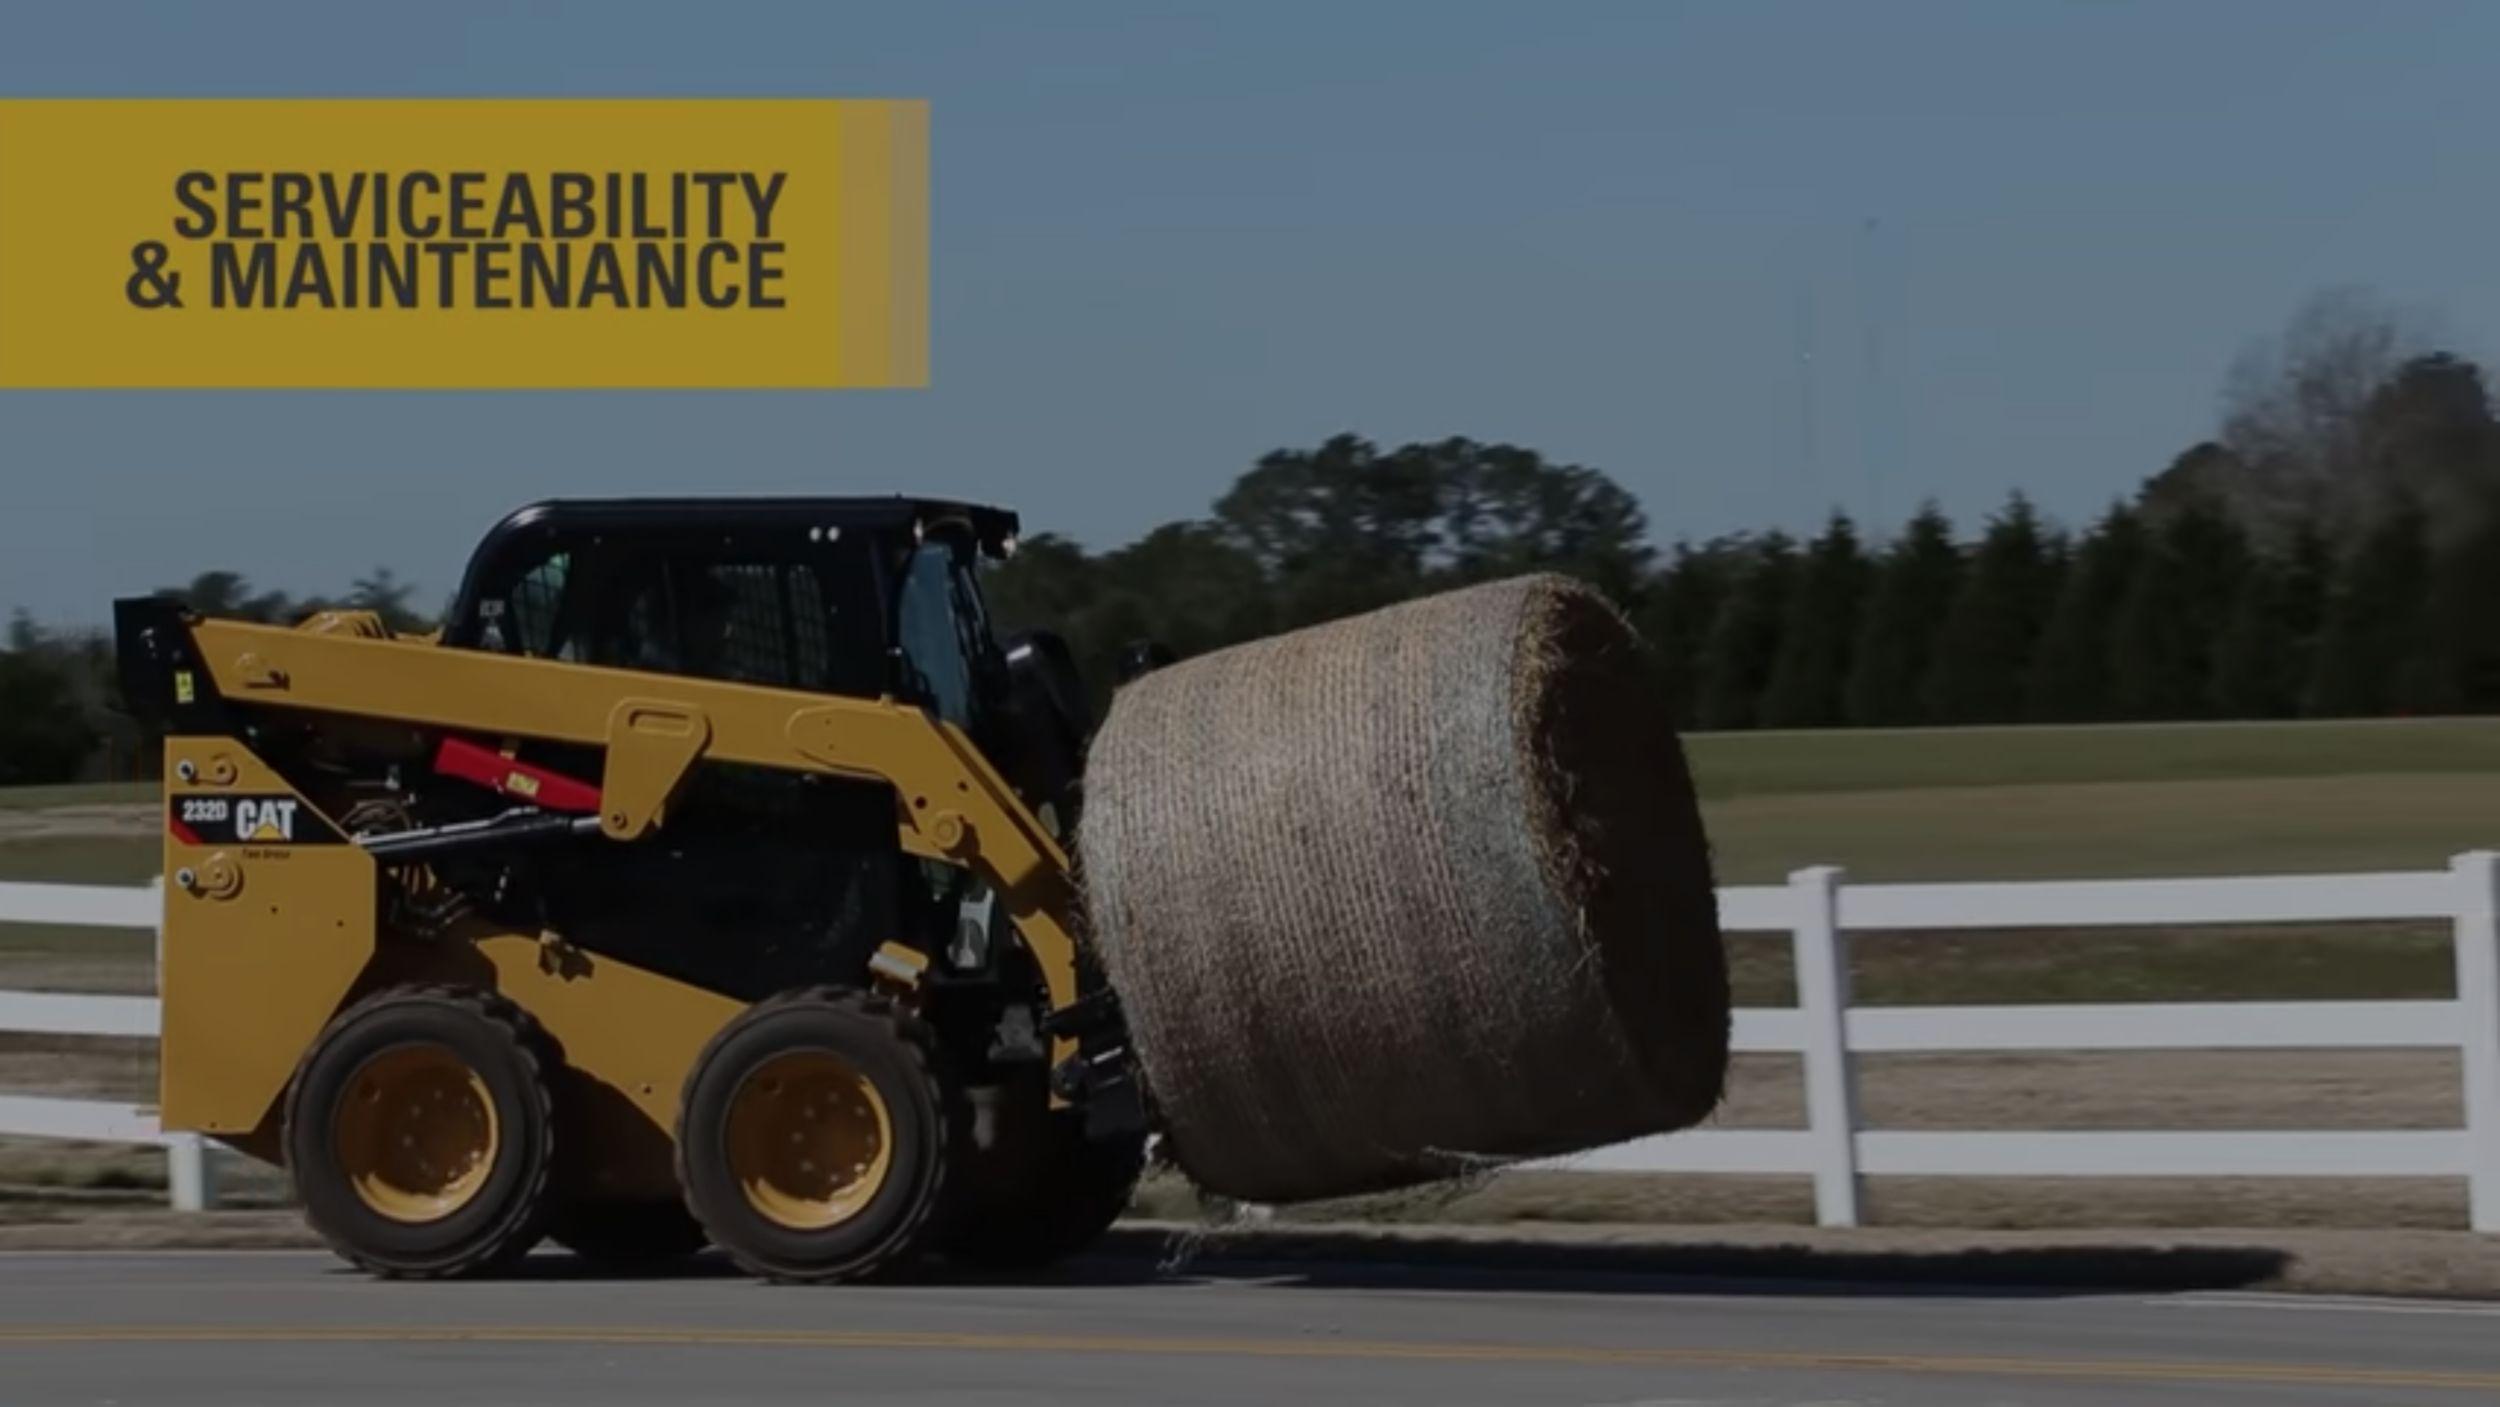 Serviceability & Maintenance